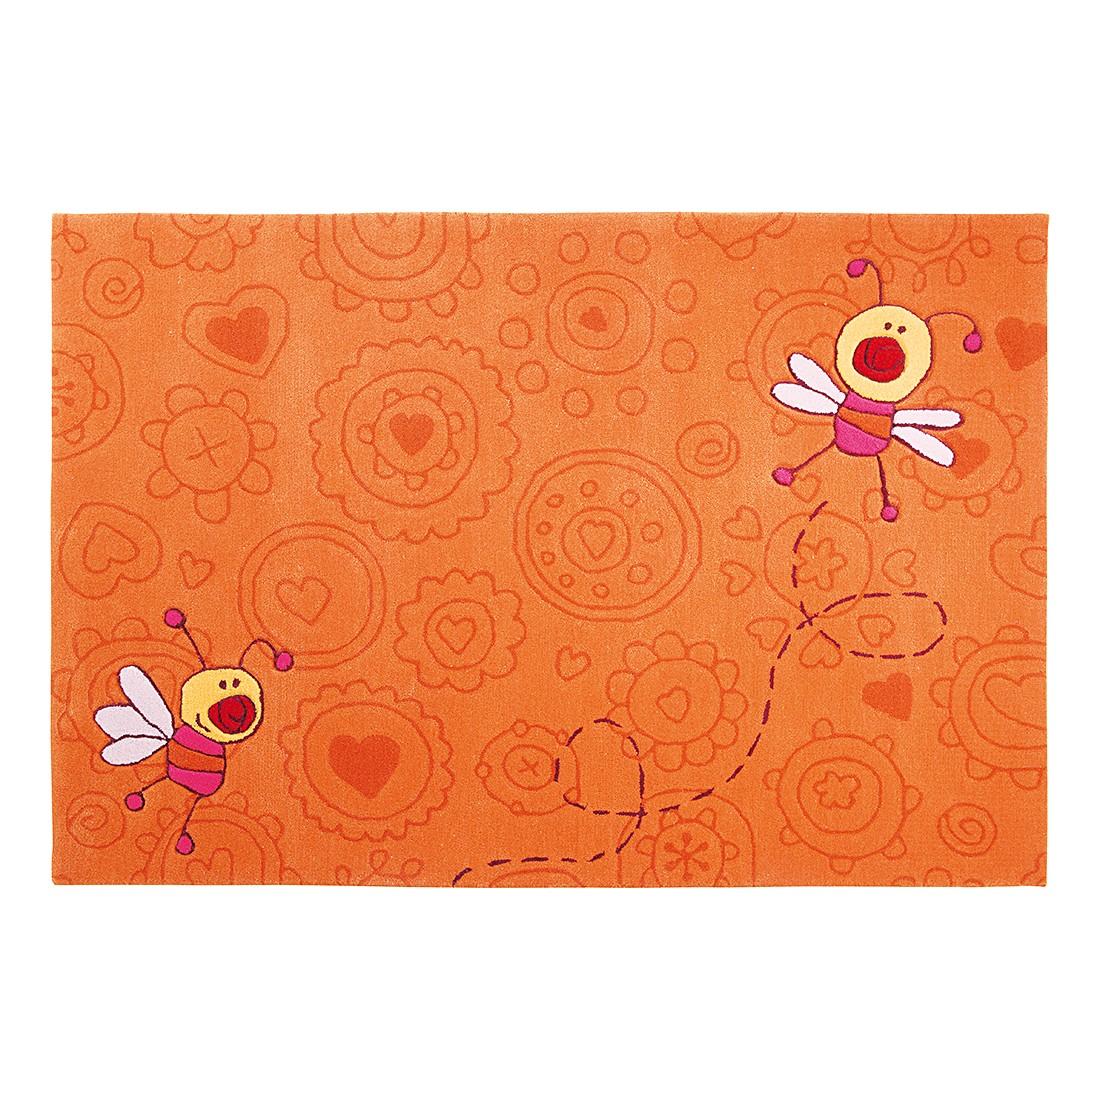 Teppich Sigikid Happy Zoo Summ-Summ Big Size – 120 x 180 cm, Sigikid bestellen